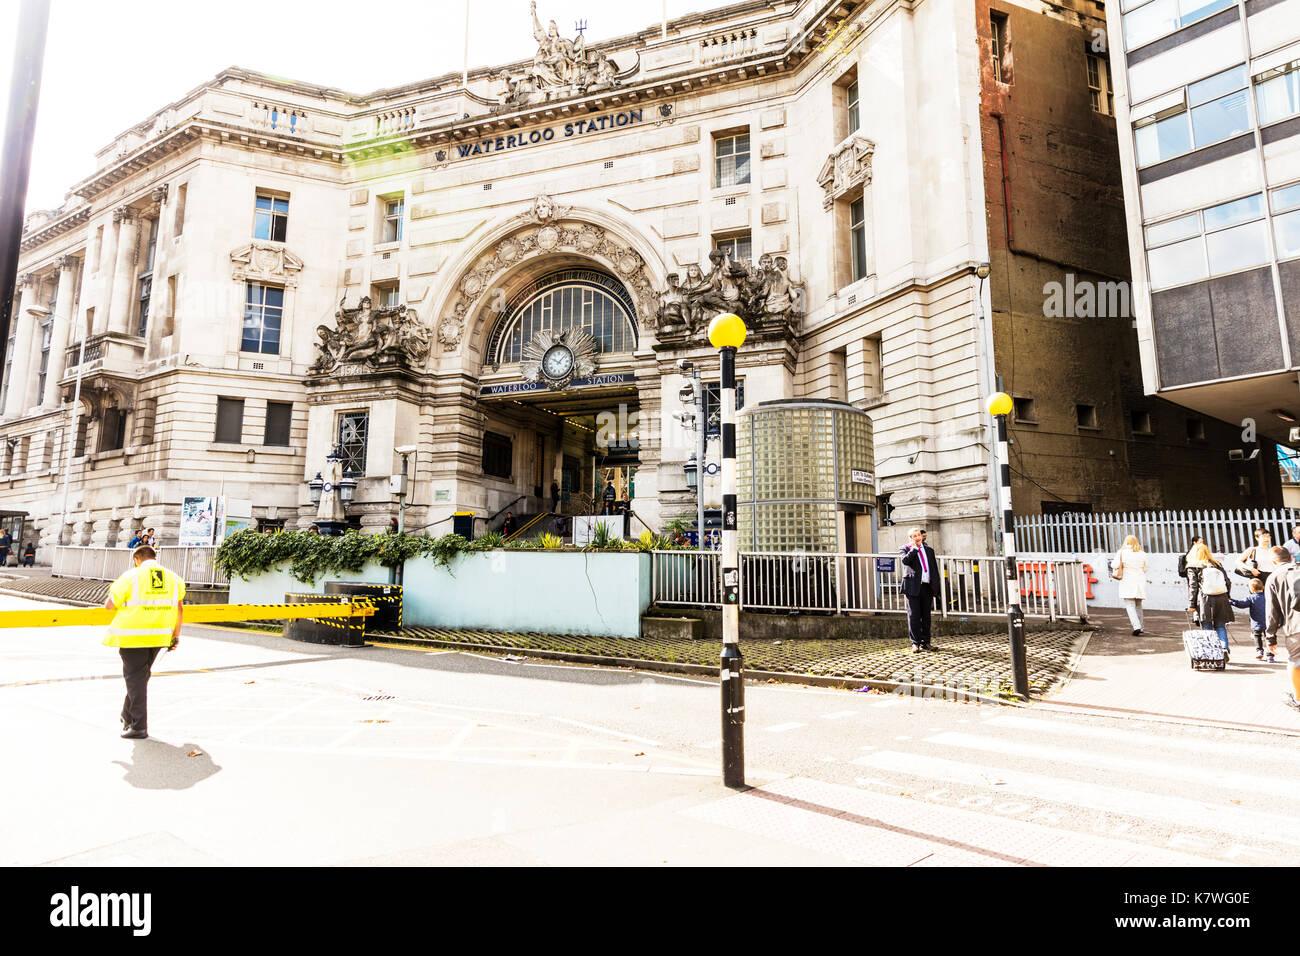 Waterloo Station London UK, Waterloo station, Waterloo Station exterior, outside Waterloo Station Waterloo train Station, Waterloo underground Station - Stock Image